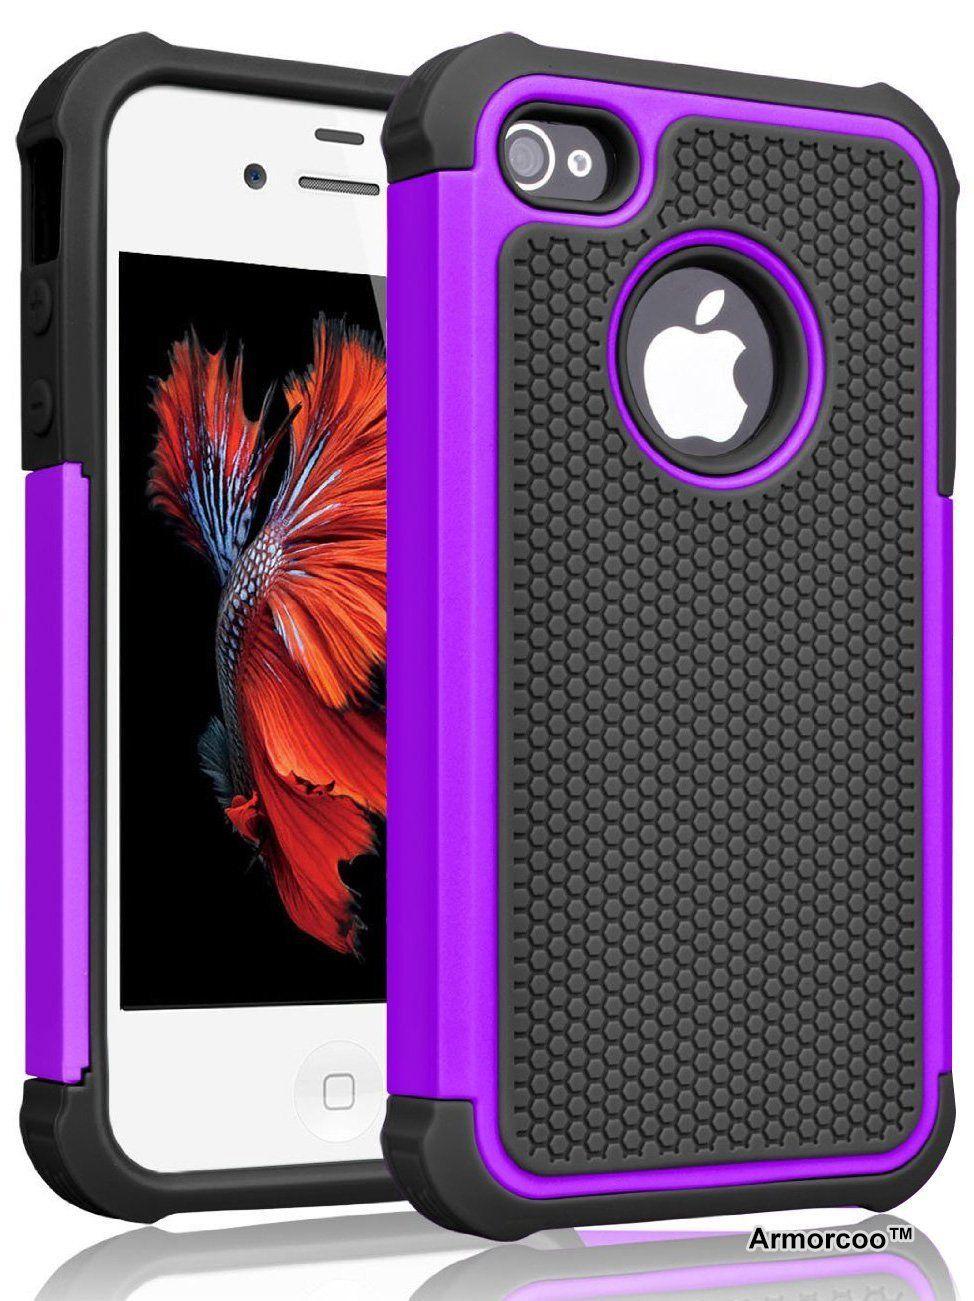 FOGEEK iPhone Case